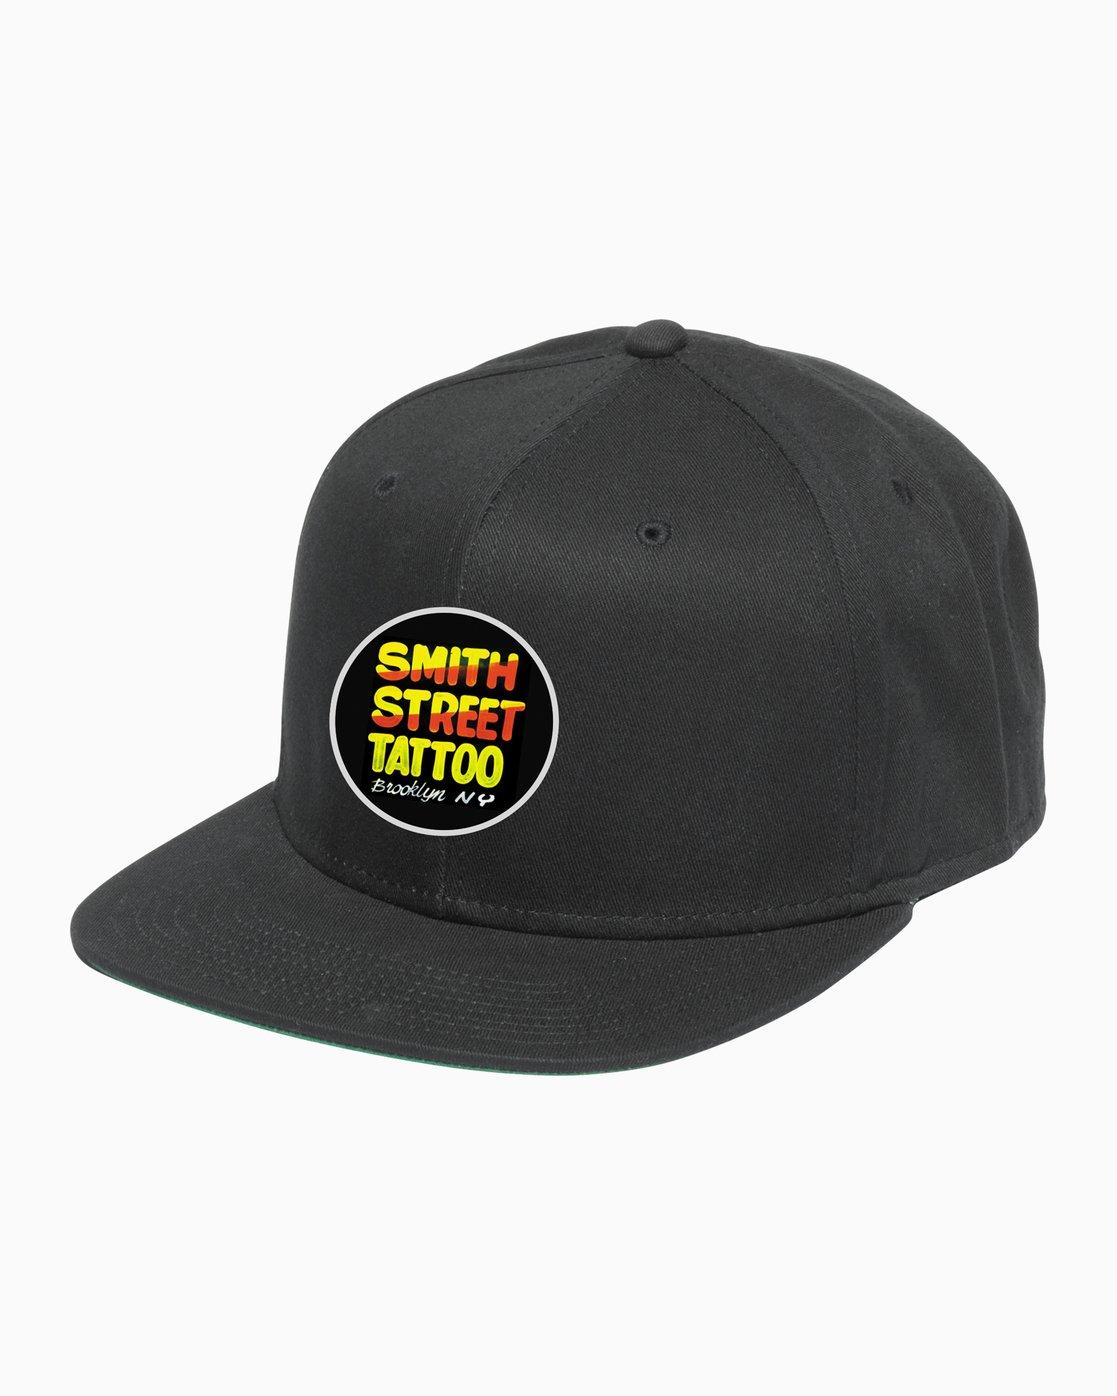 d066c6d96 Smith Street Nurse Sign 1 Snapback Hat